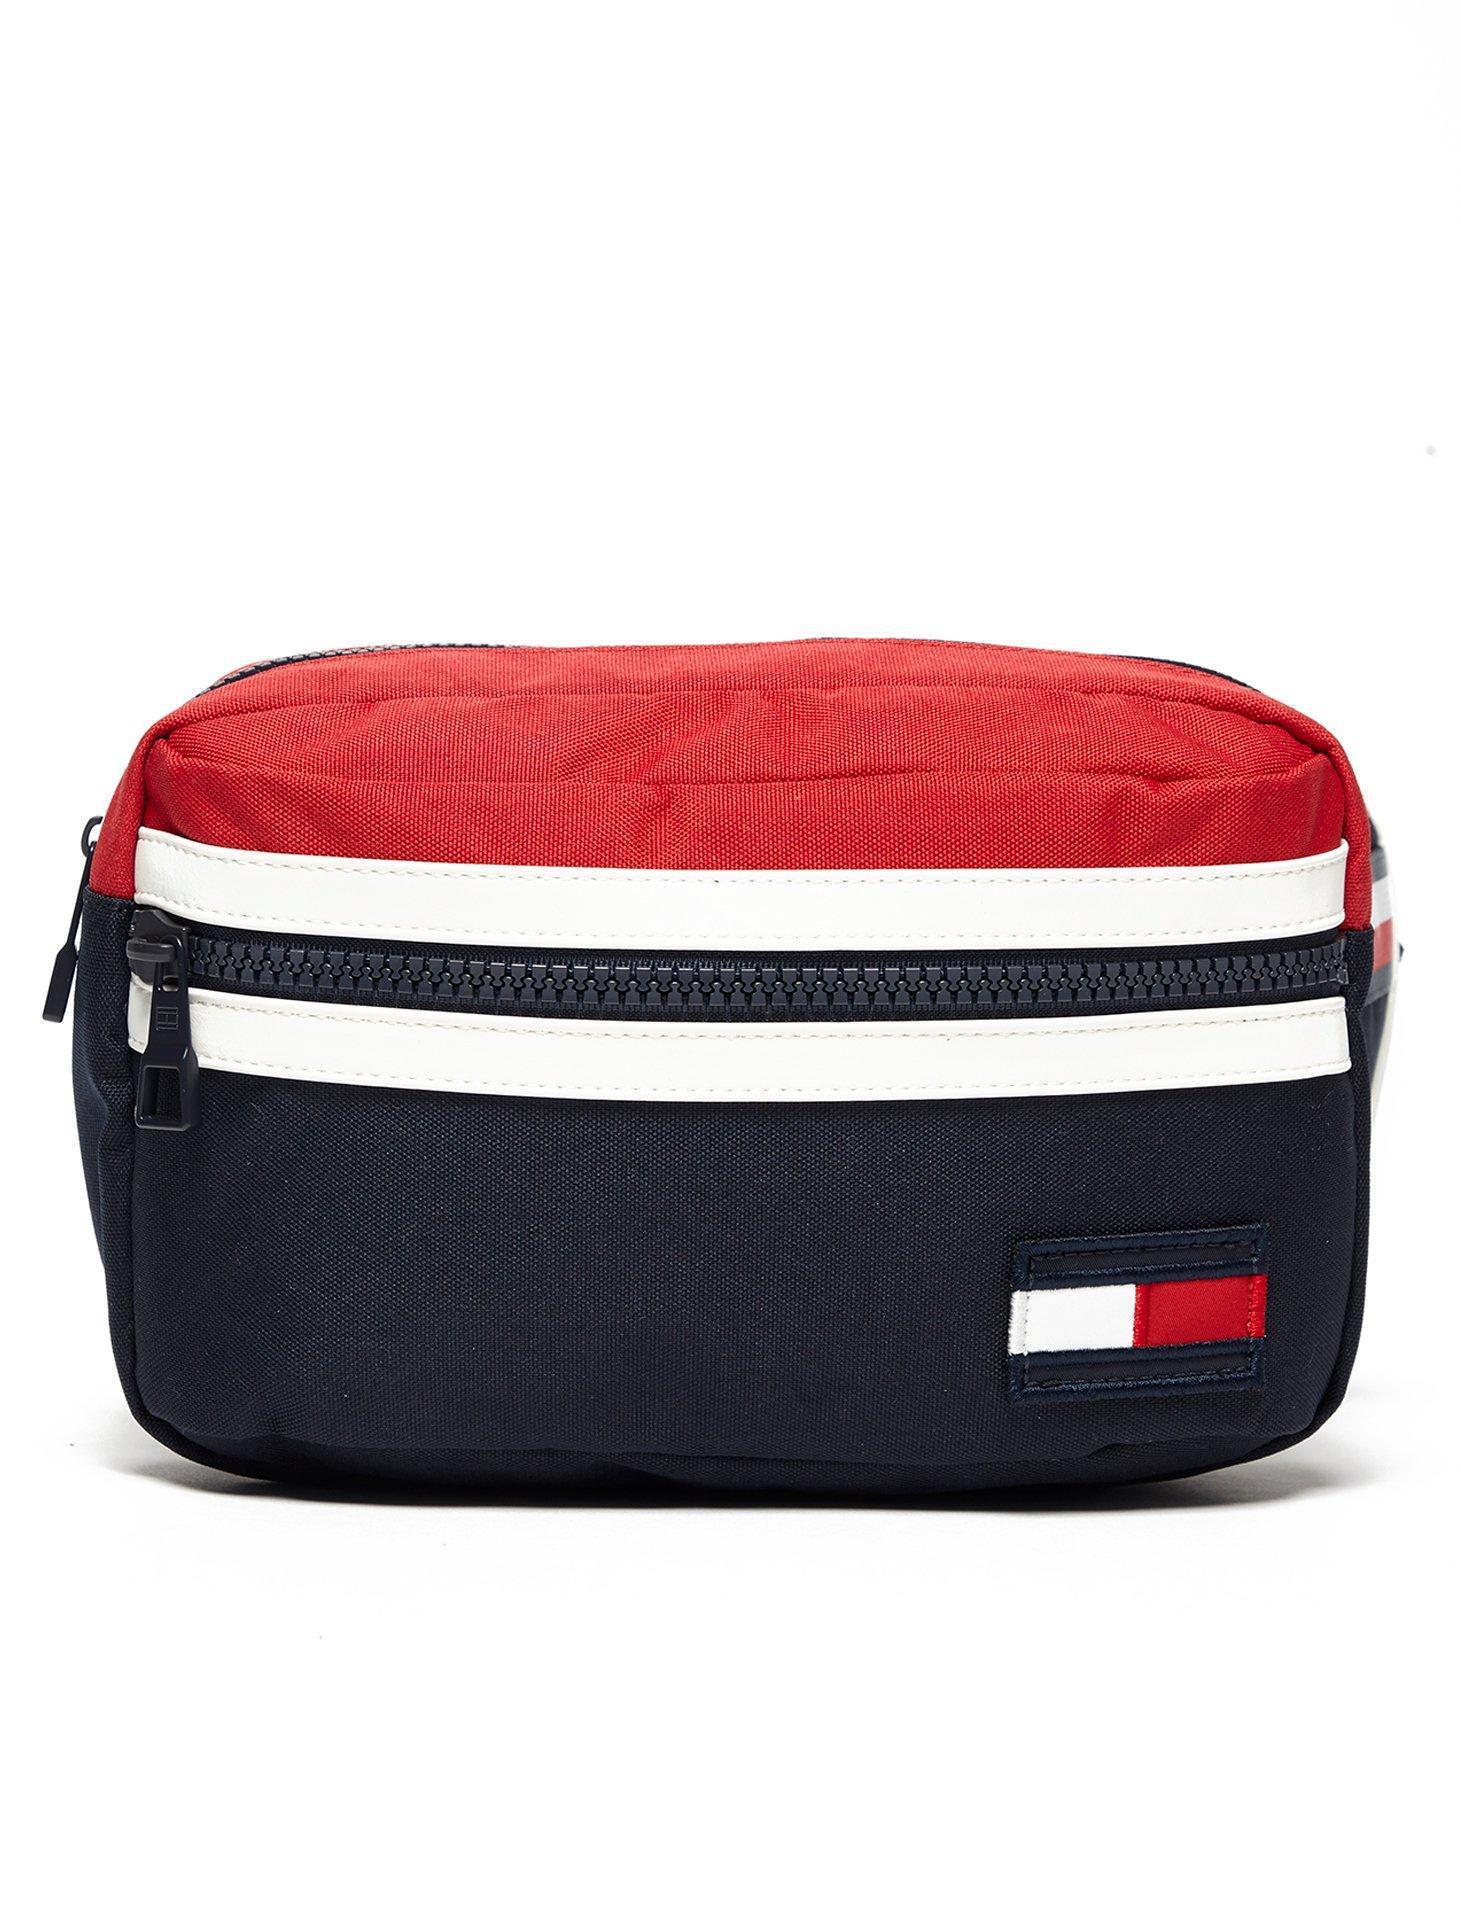 3f1acd85 Tommy Hilfiger Crossbody Waist Bag in Blue for Men - Lyst